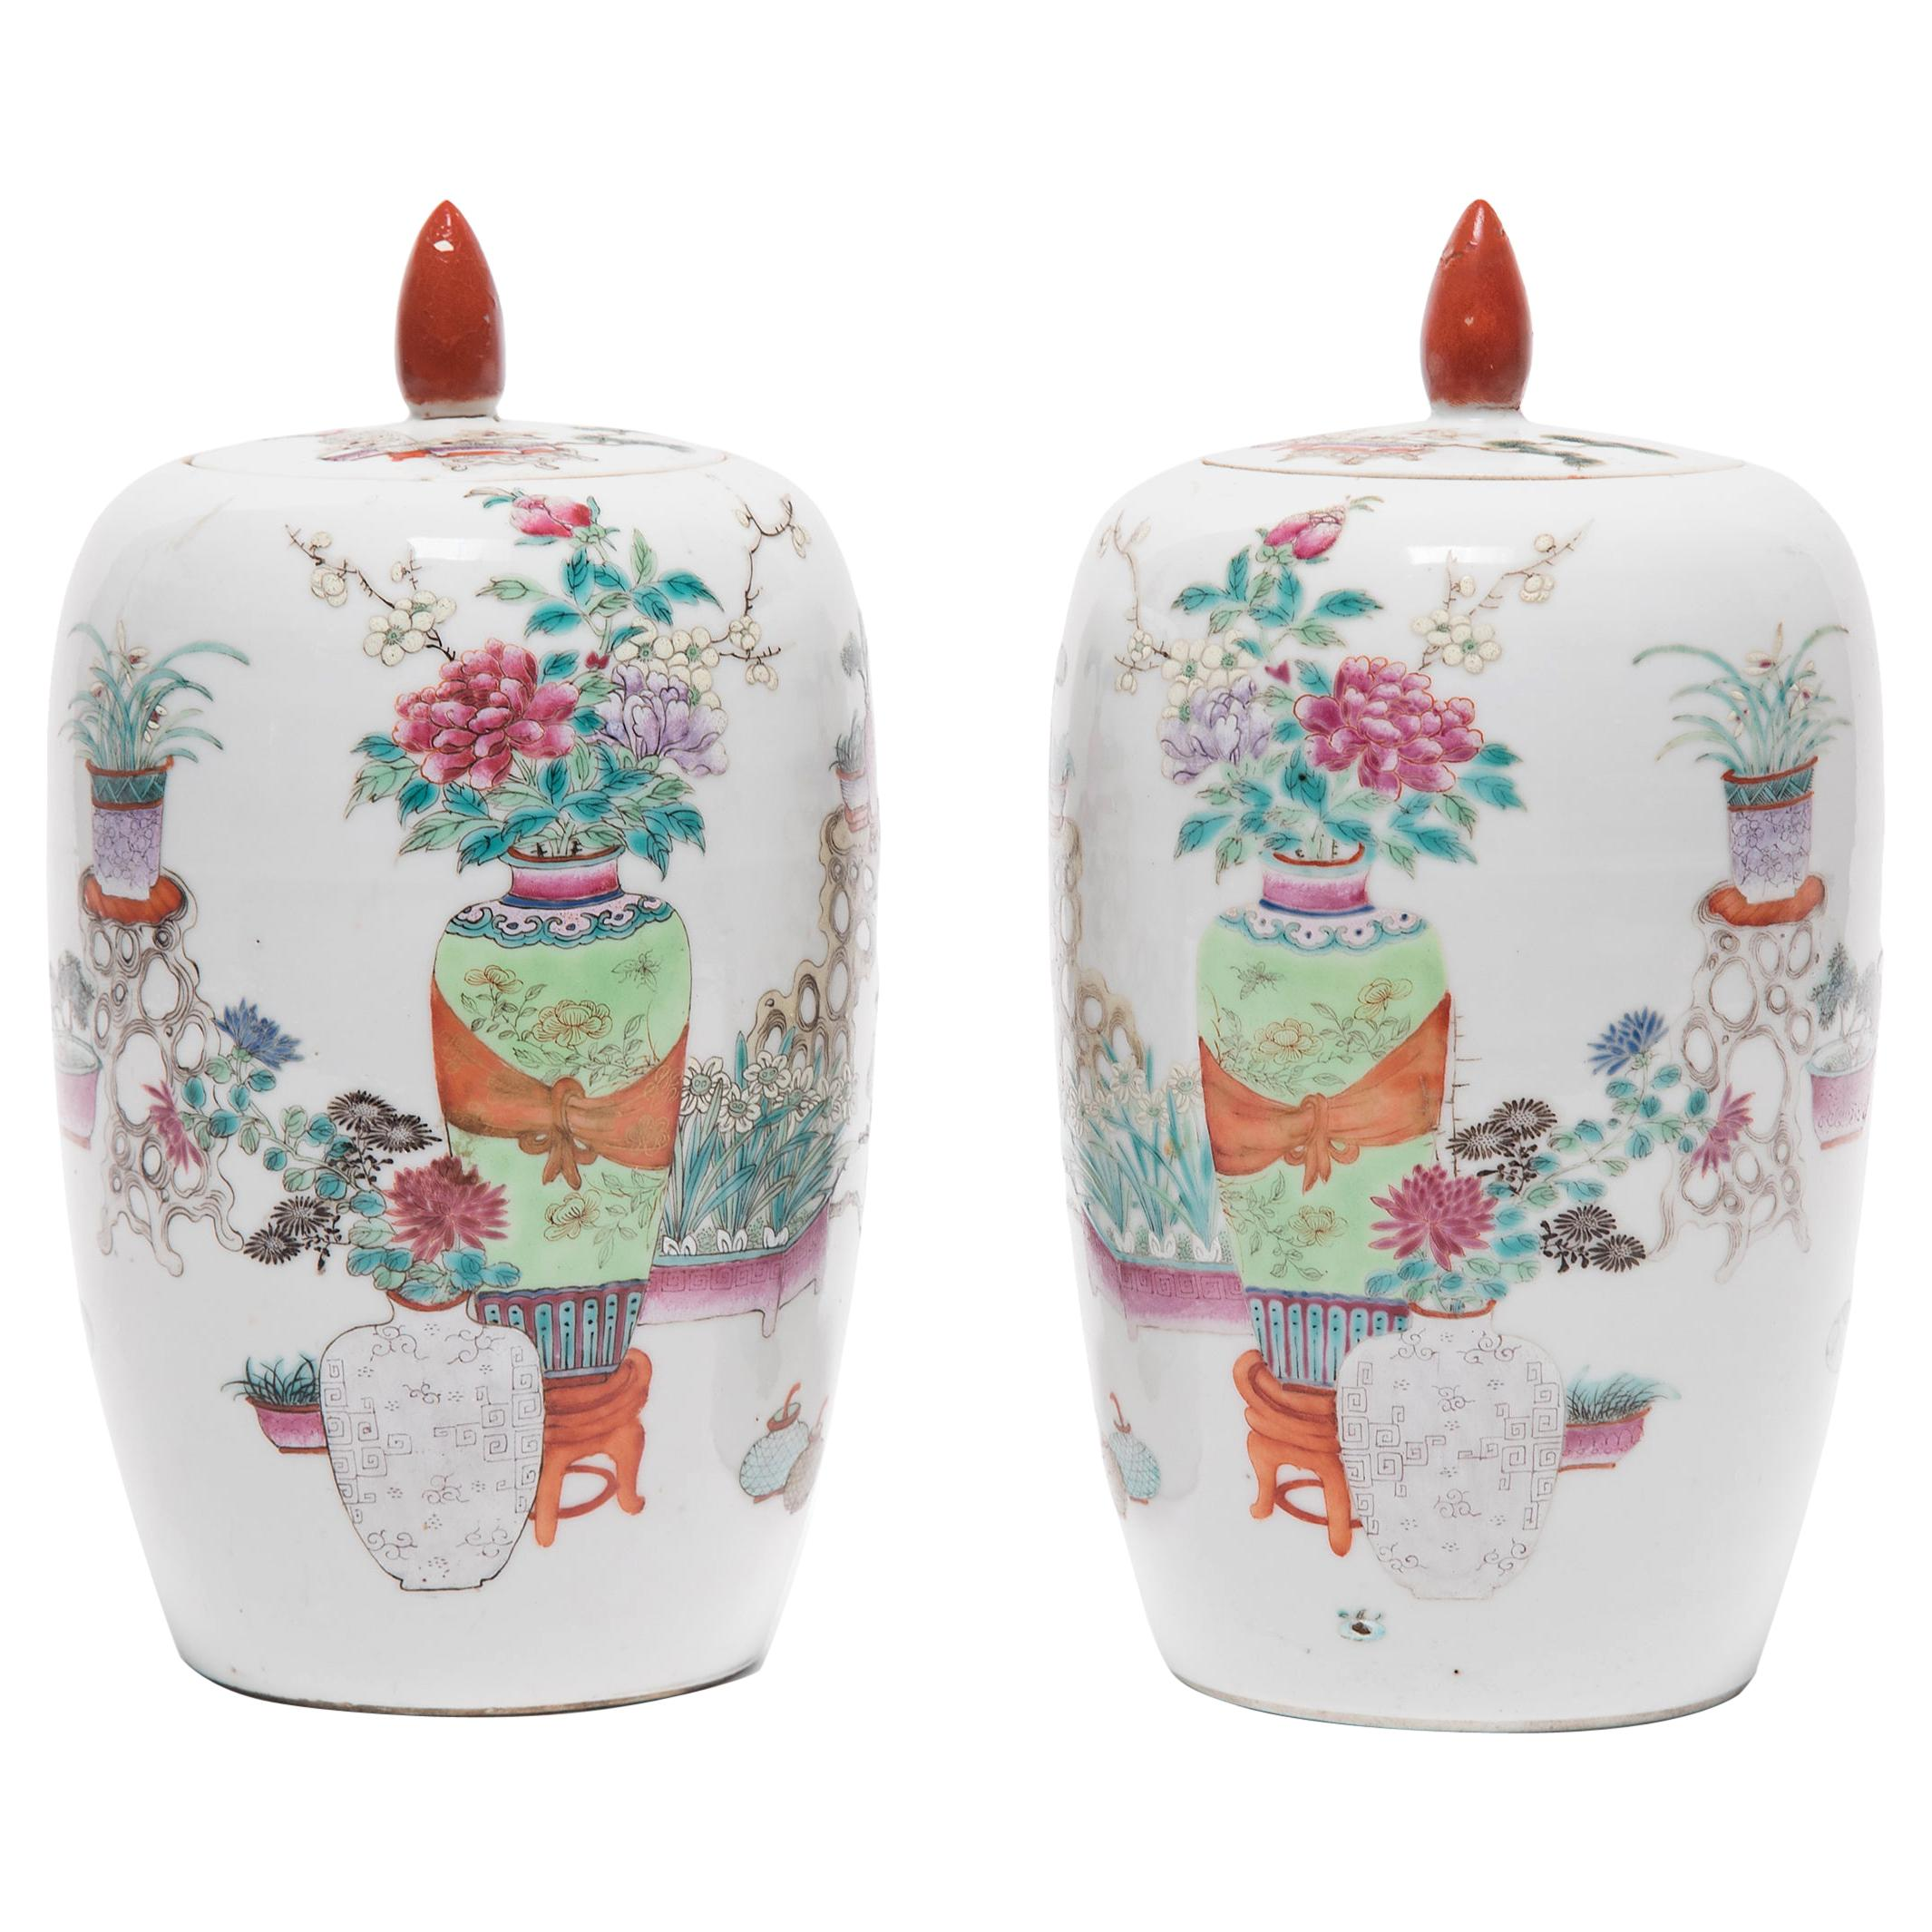 Pair of Petite Chinese Famille Rose Ginger Jars, c. 1900